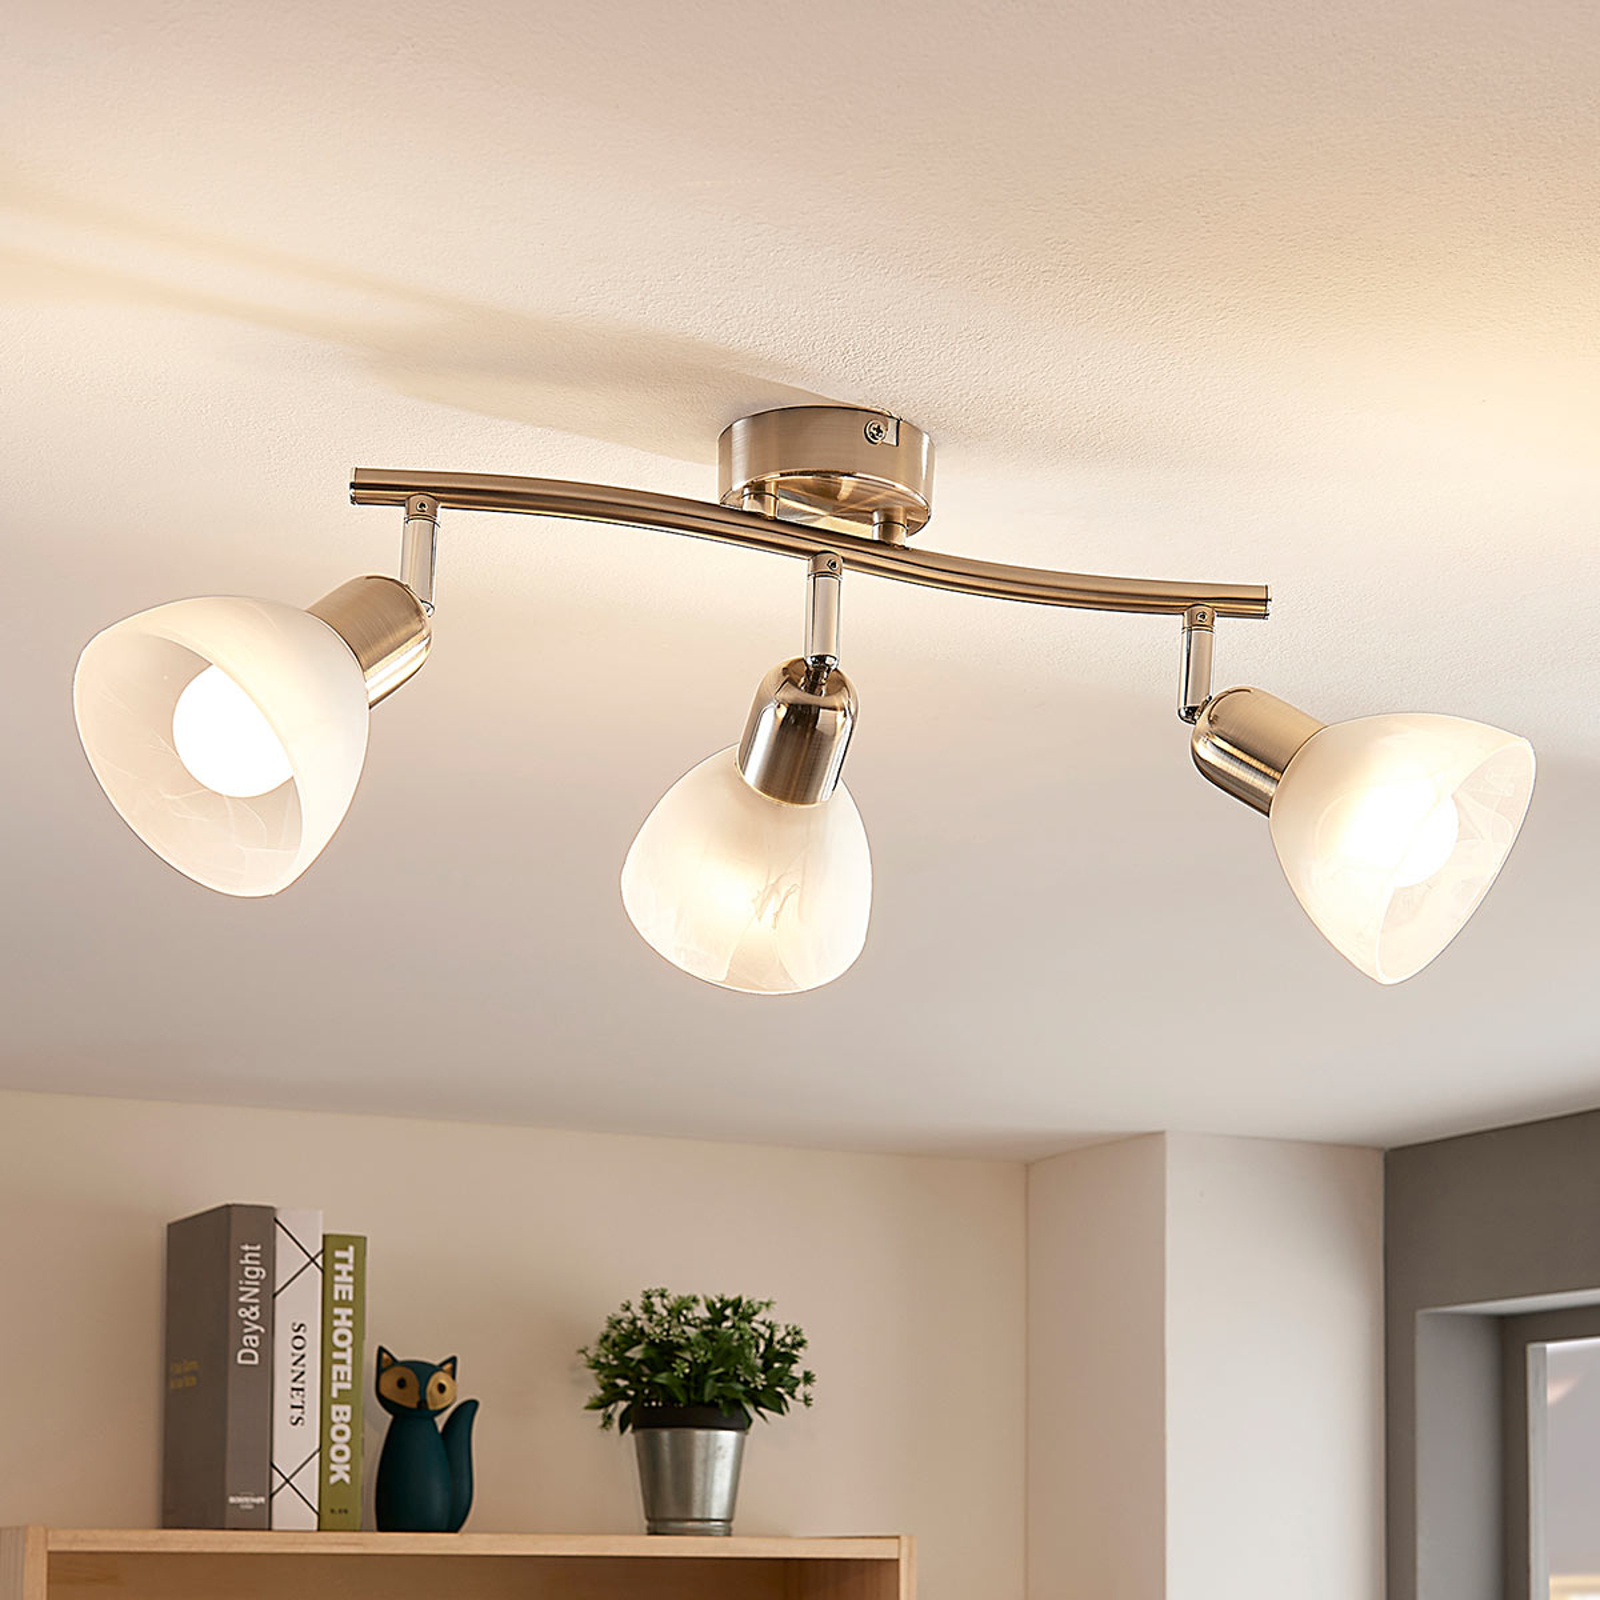 Lindby Paulina LED ceiling lamp, 3-bulb, long_9621641_1